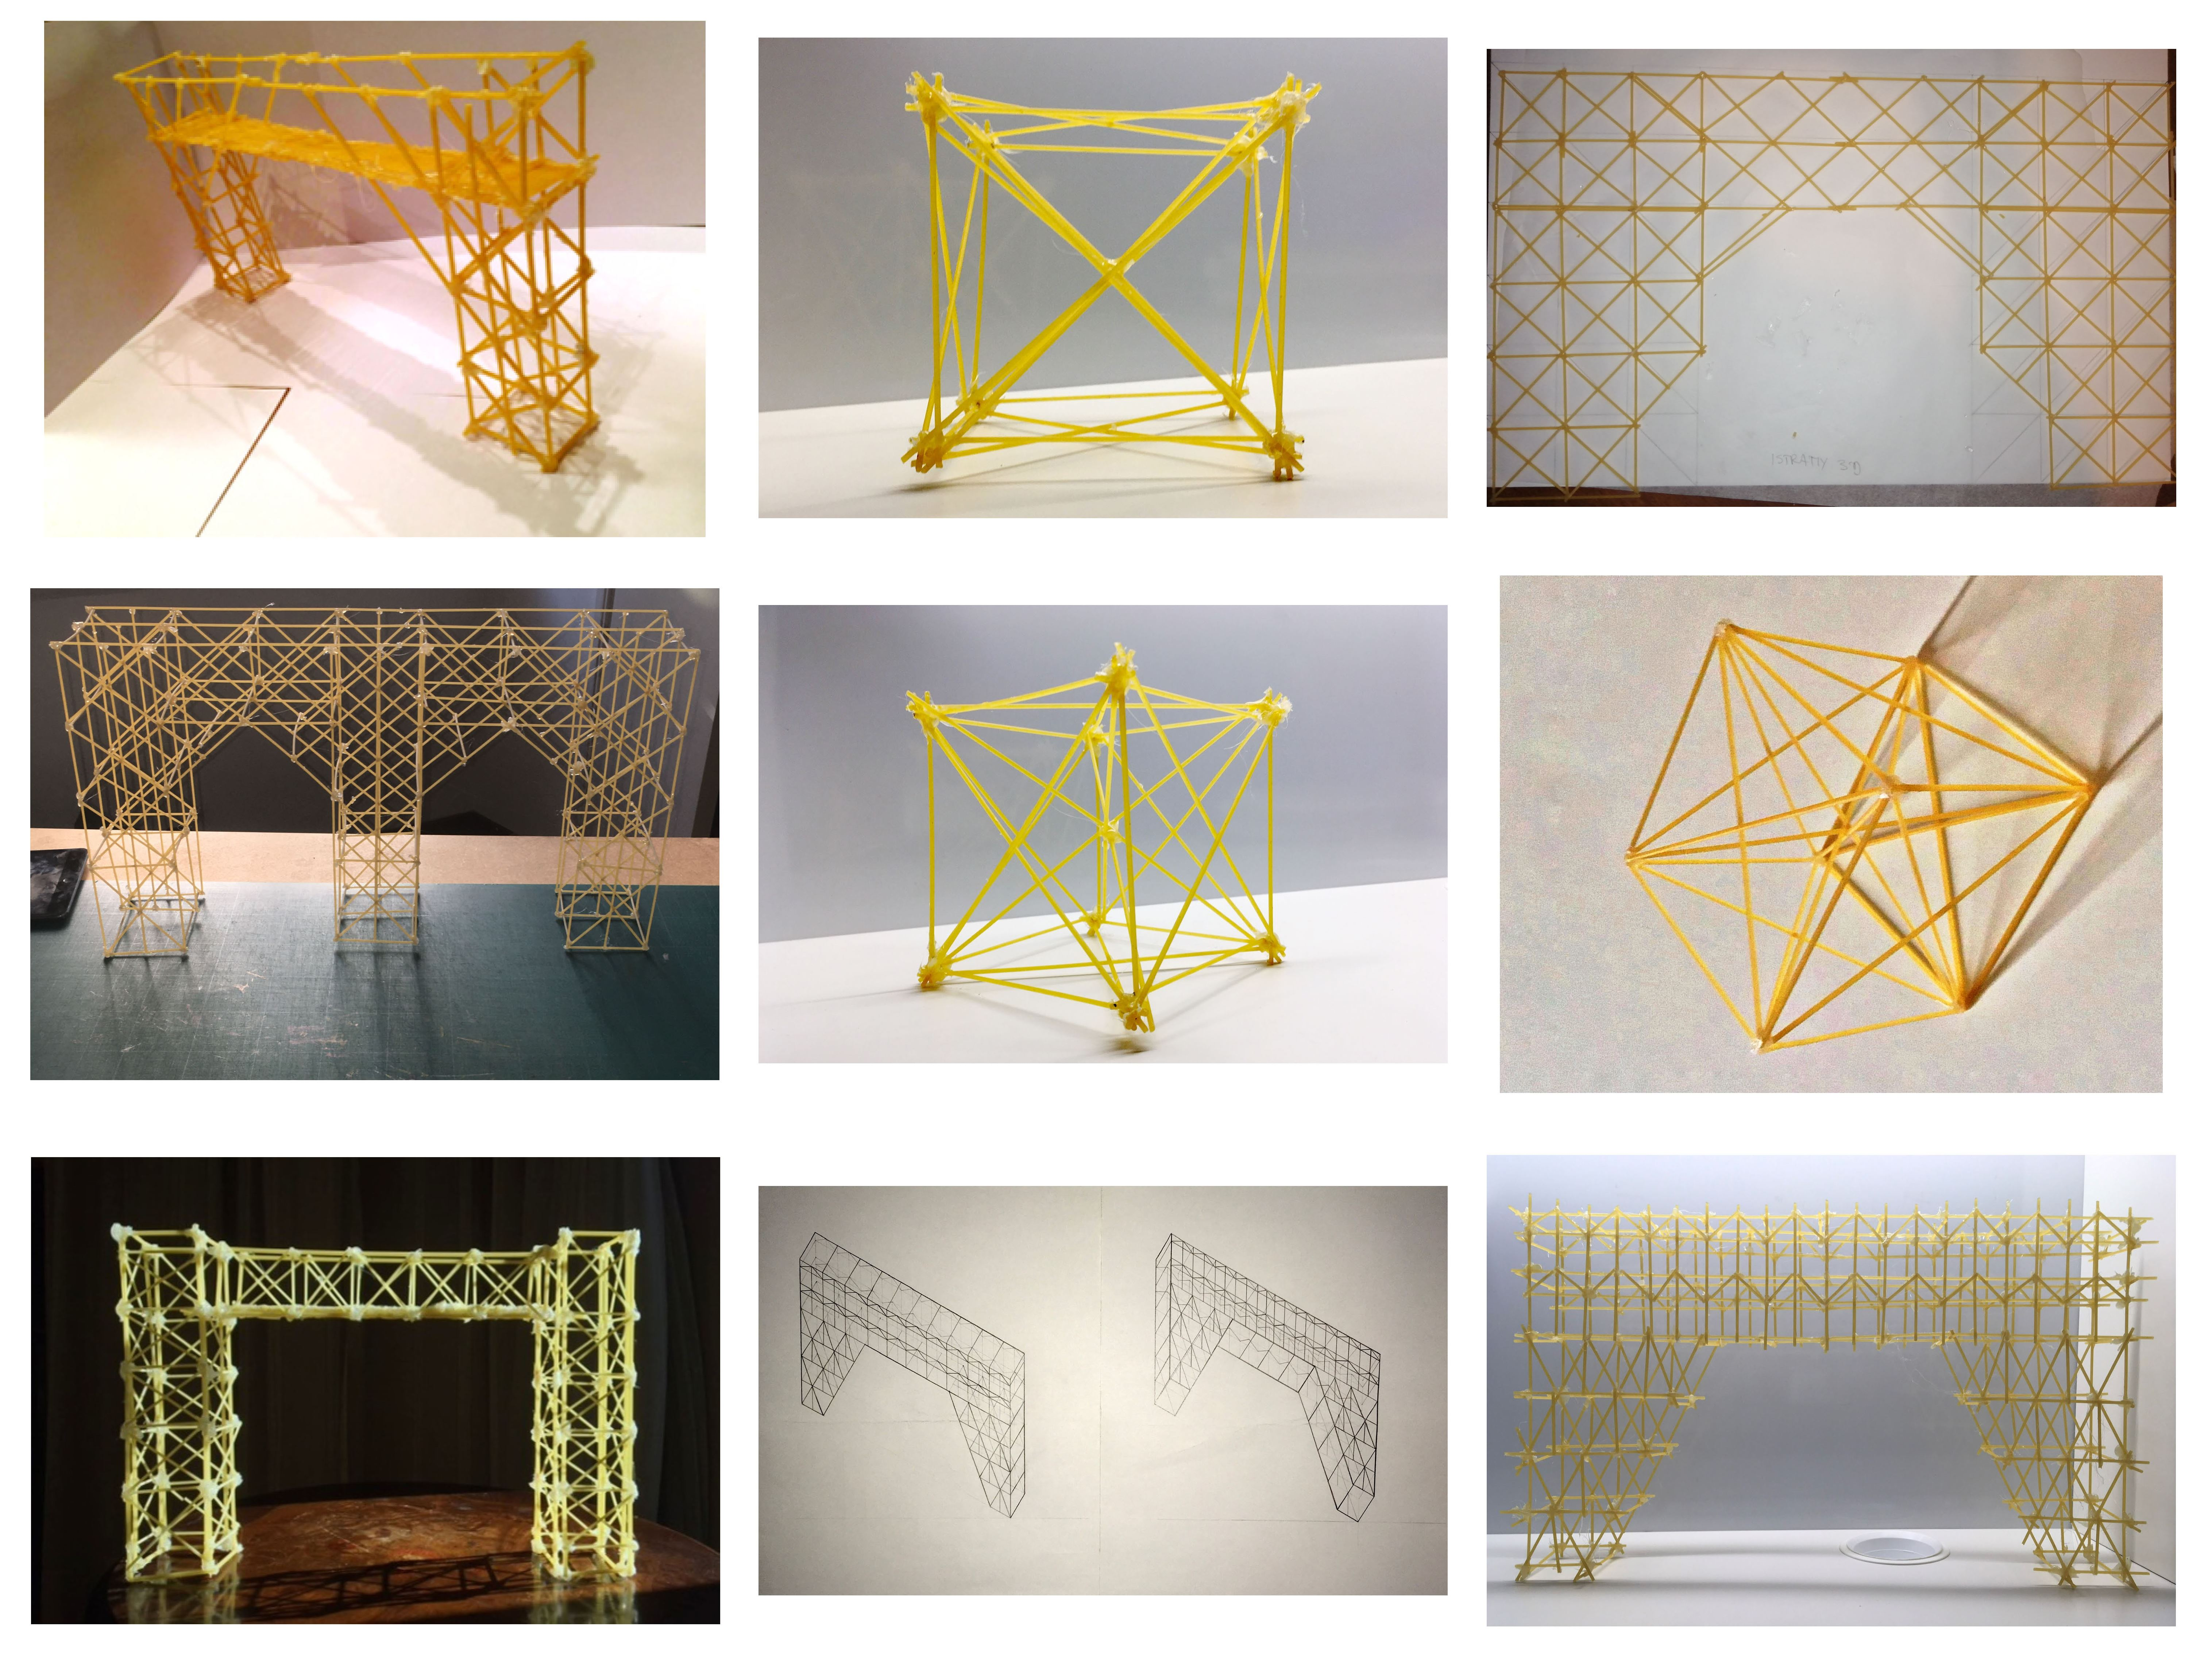 2020.11-3Dha-Gallery-liceo-DaD-3Dha-ponte-reticolare-e-cubo-3x3-HR_Pag...